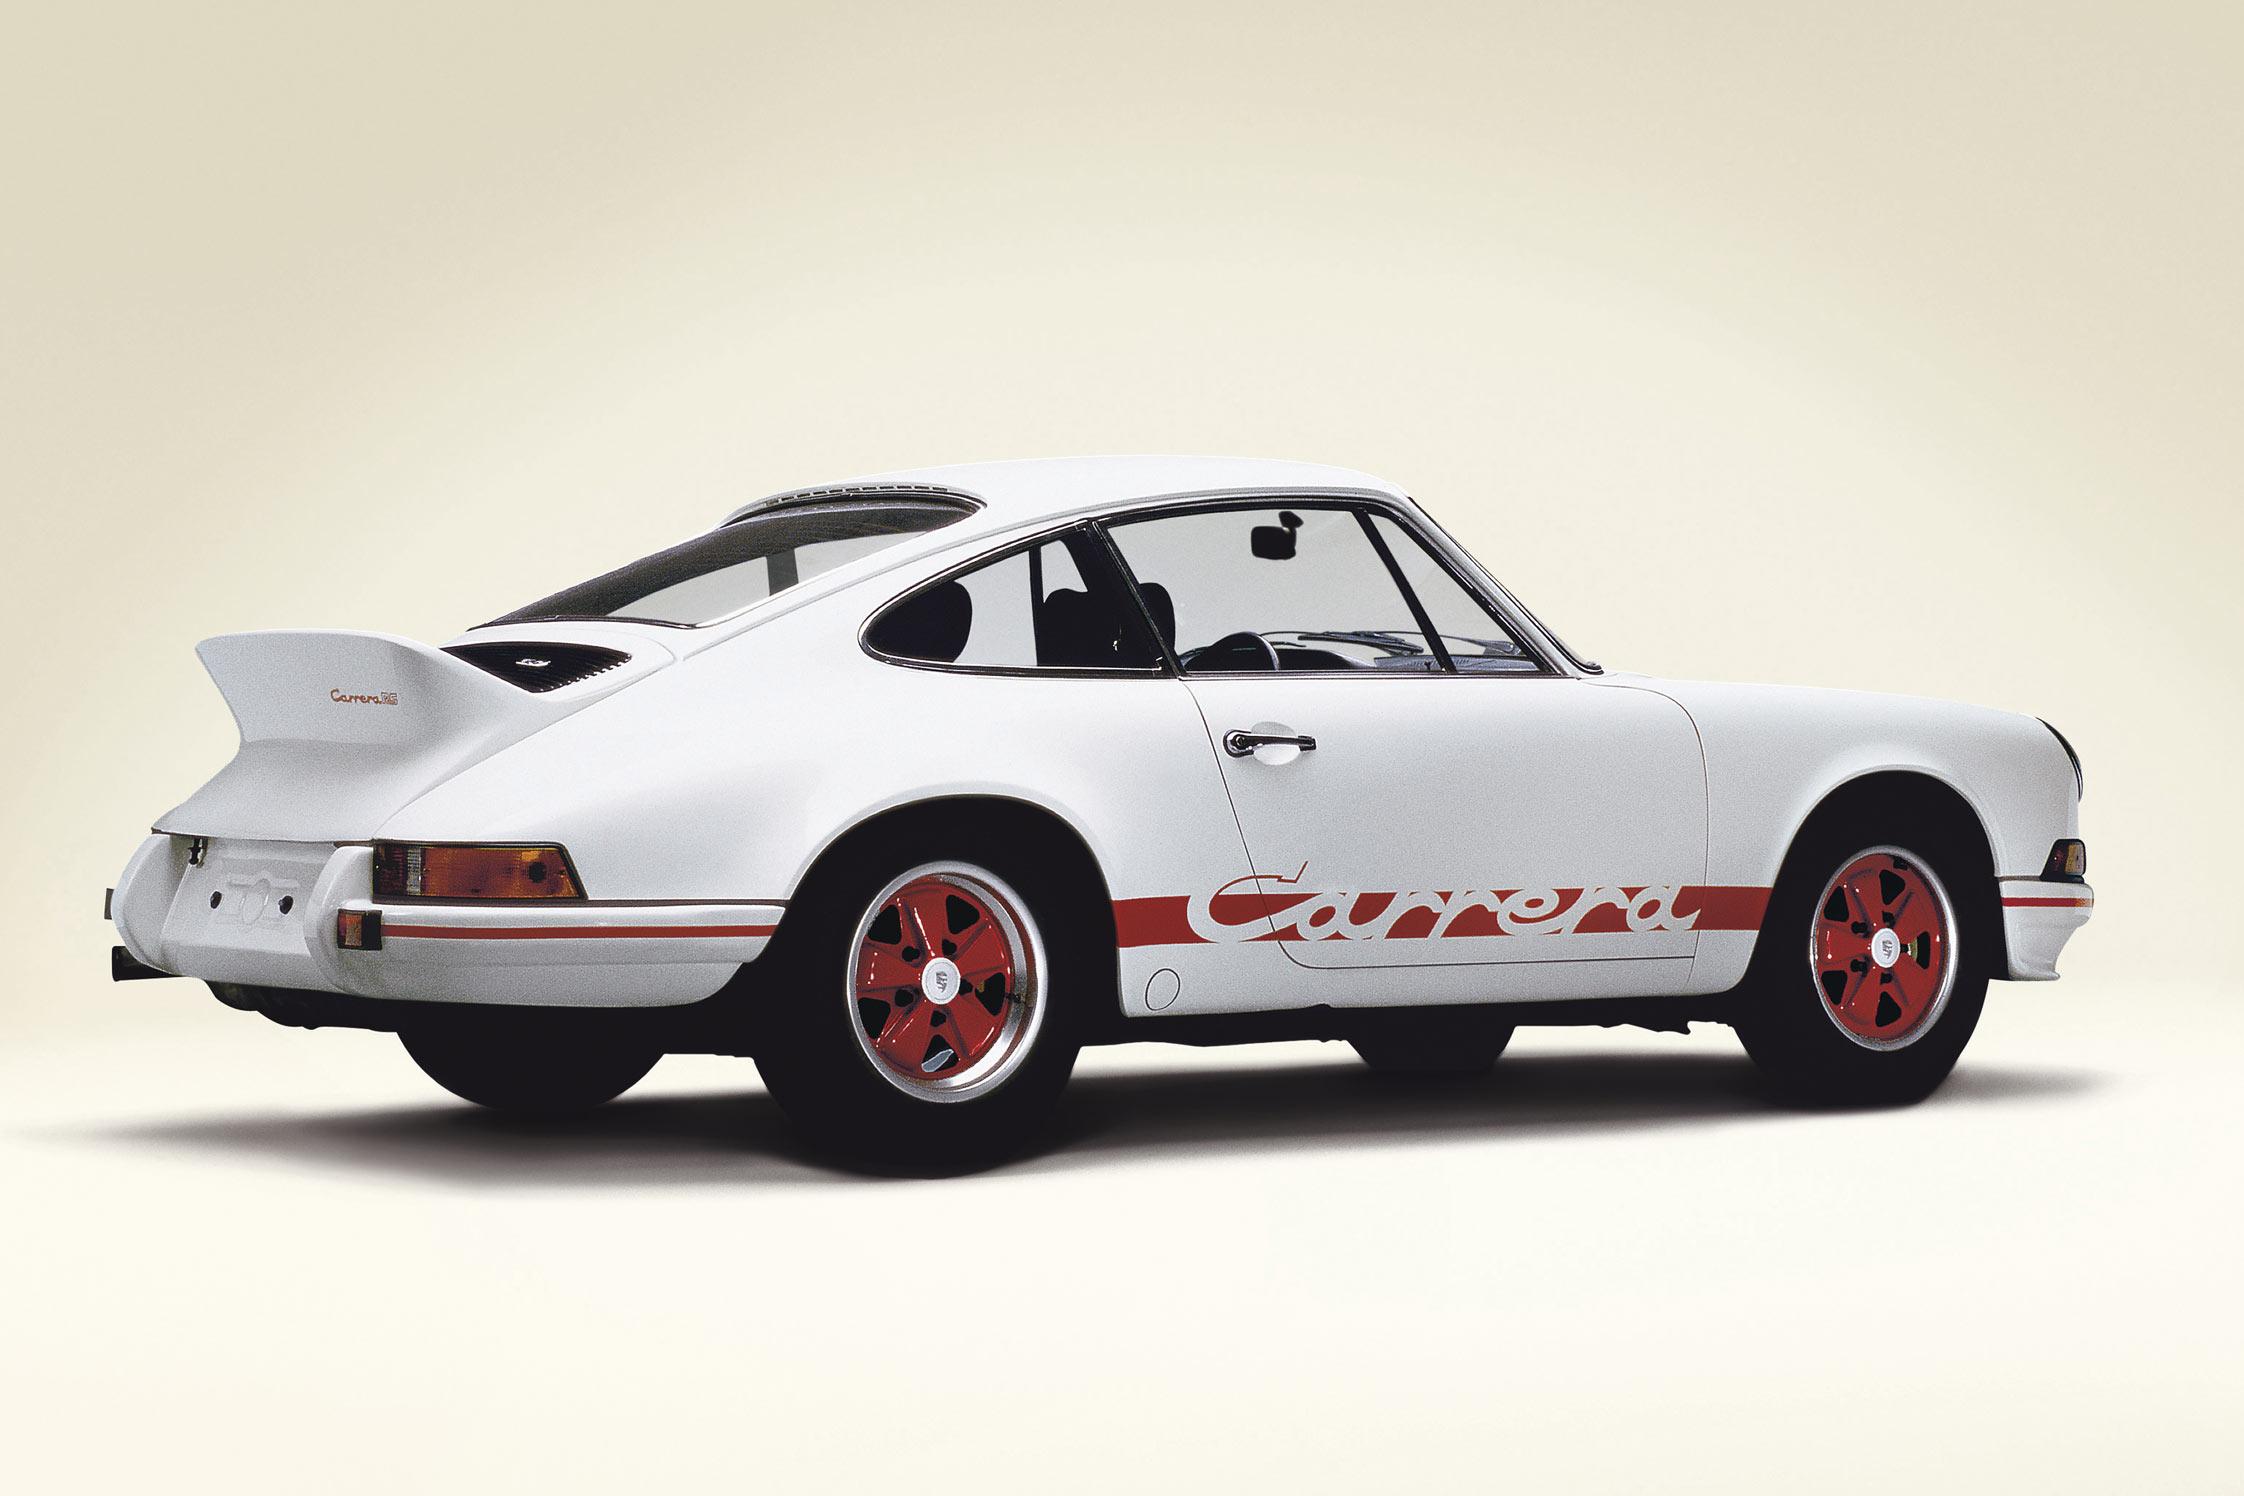 1972 1973 porsche 911 carrera rs 2 7 dark cars wallpapers. Black Bedroom Furniture Sets. Home Design Ideas